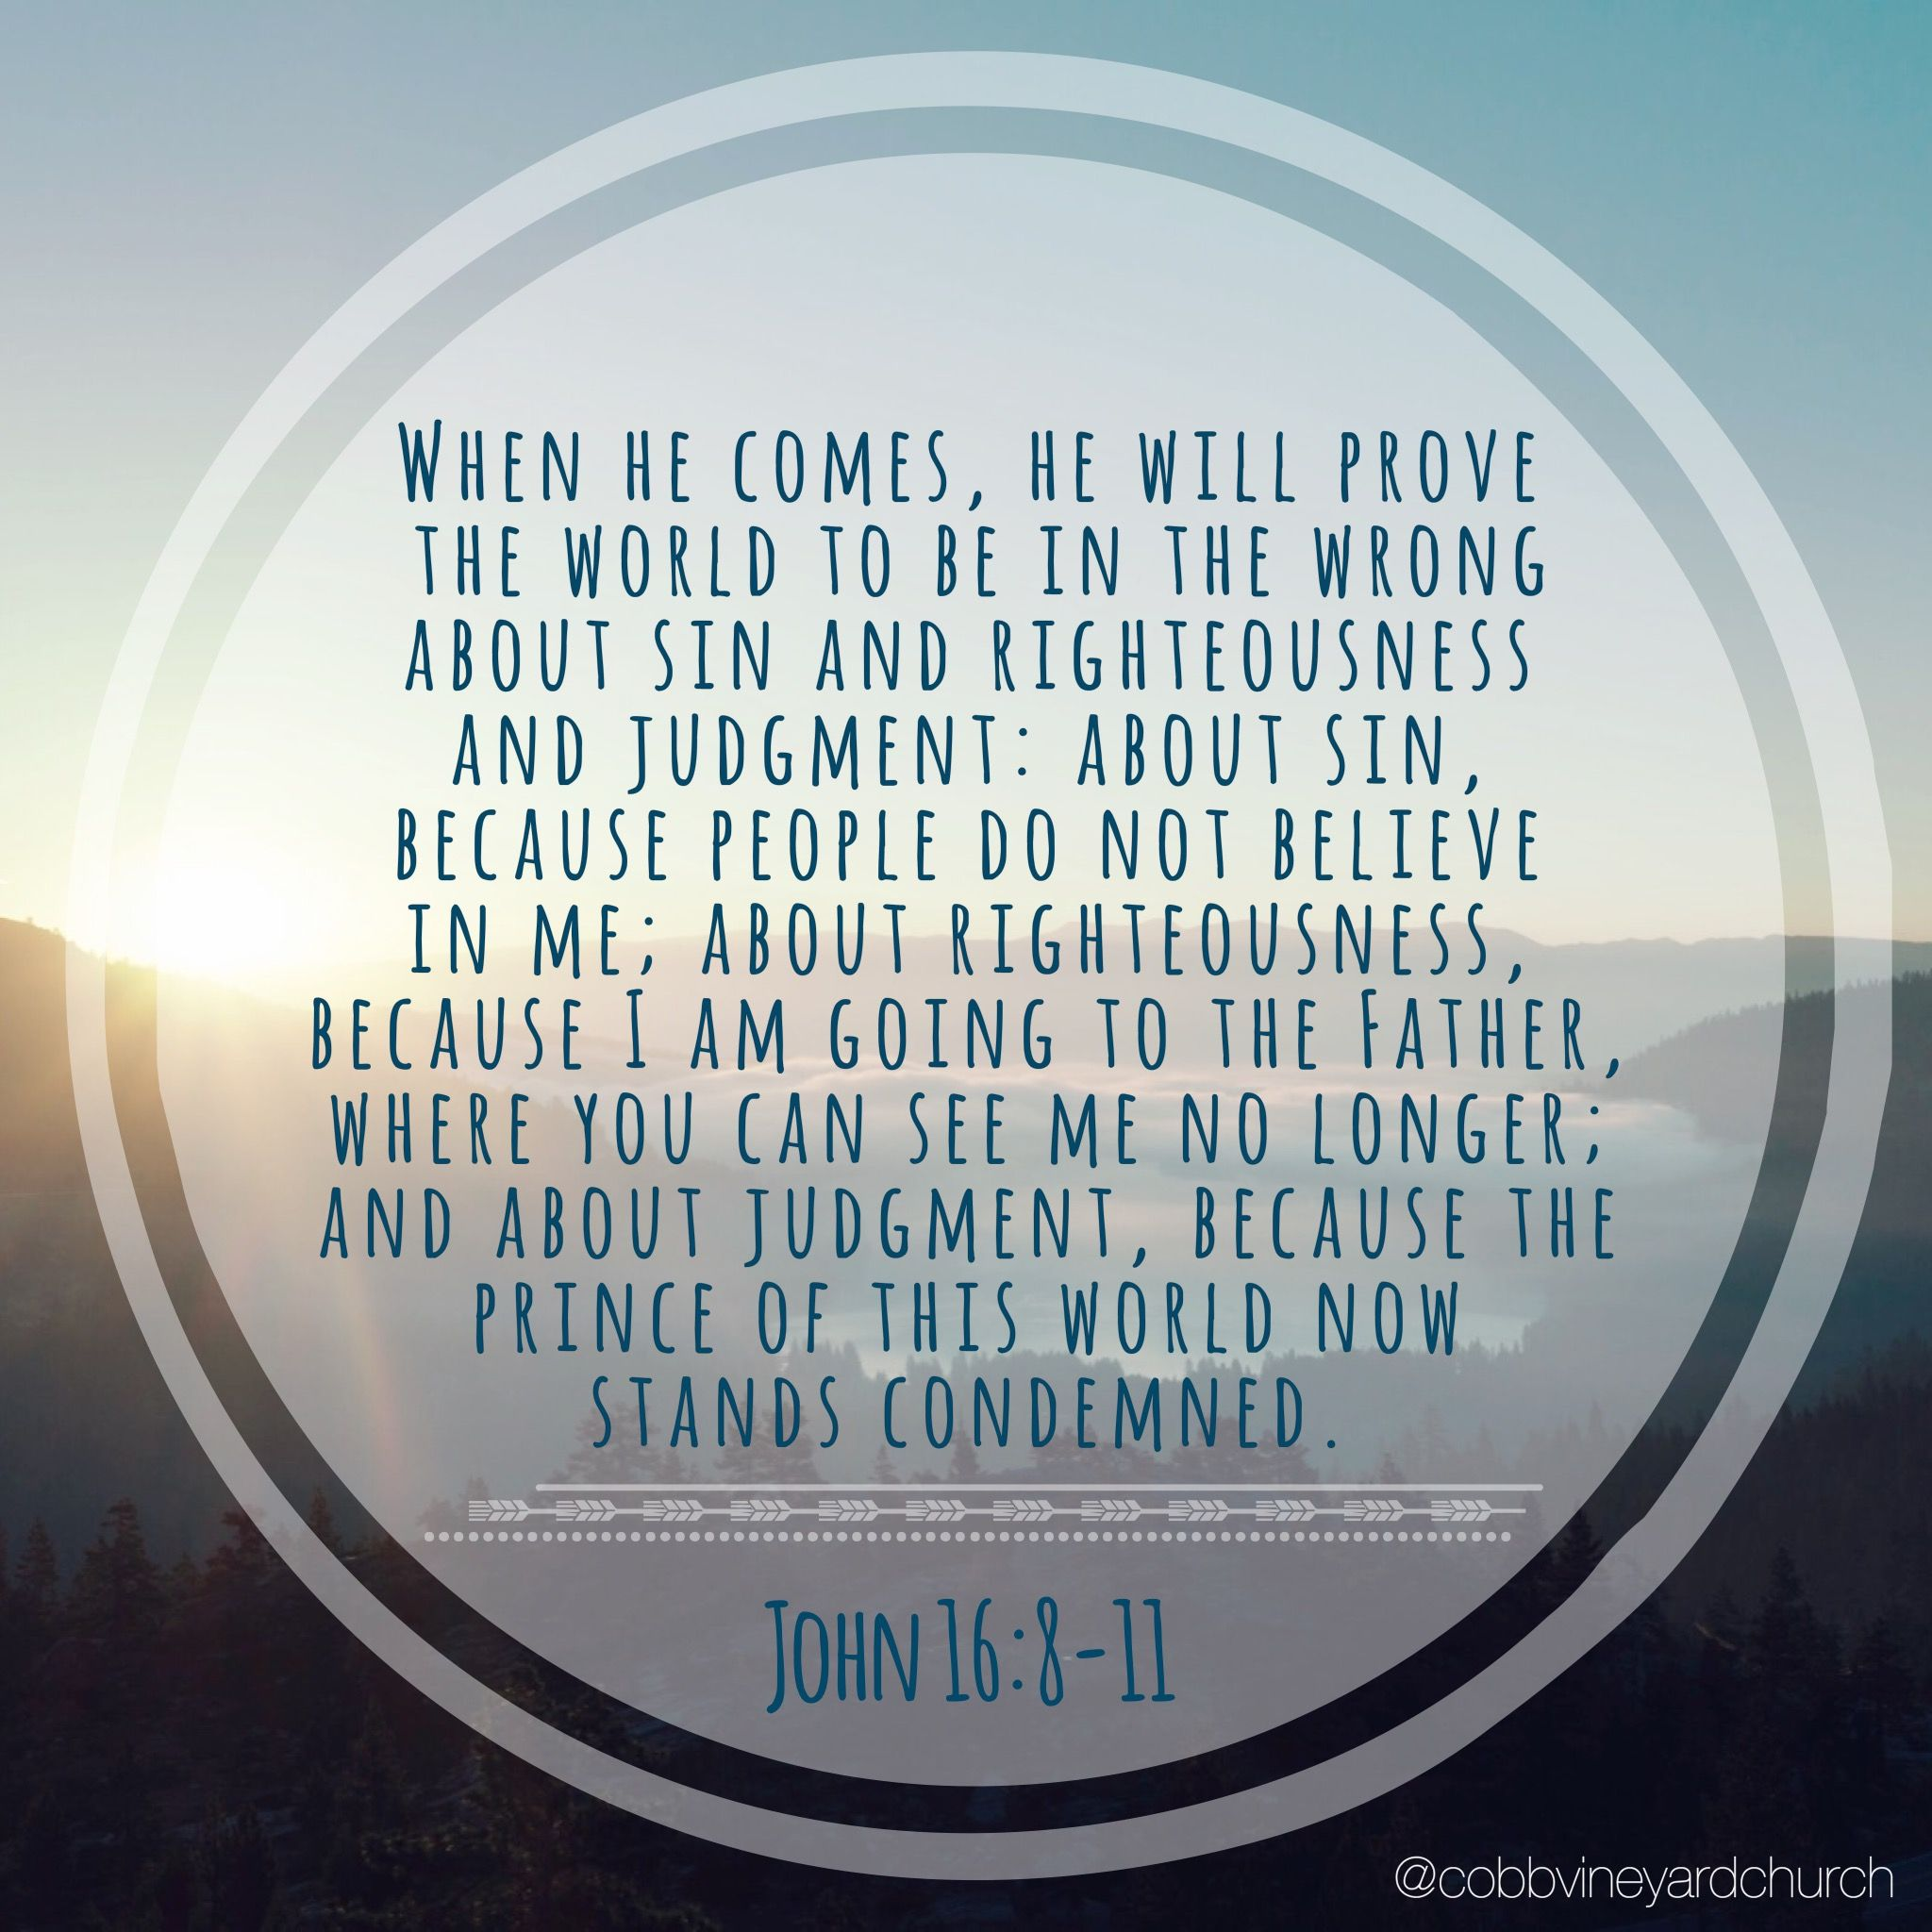 John 16:8-11 #Scripture #Navigatinglife #CobbVineyardChurch #Bible #Verse #Truth #Scripture #NewTestament #Mountain #Kennesaw #Acworth #cobbcounty #Georgia #Creation